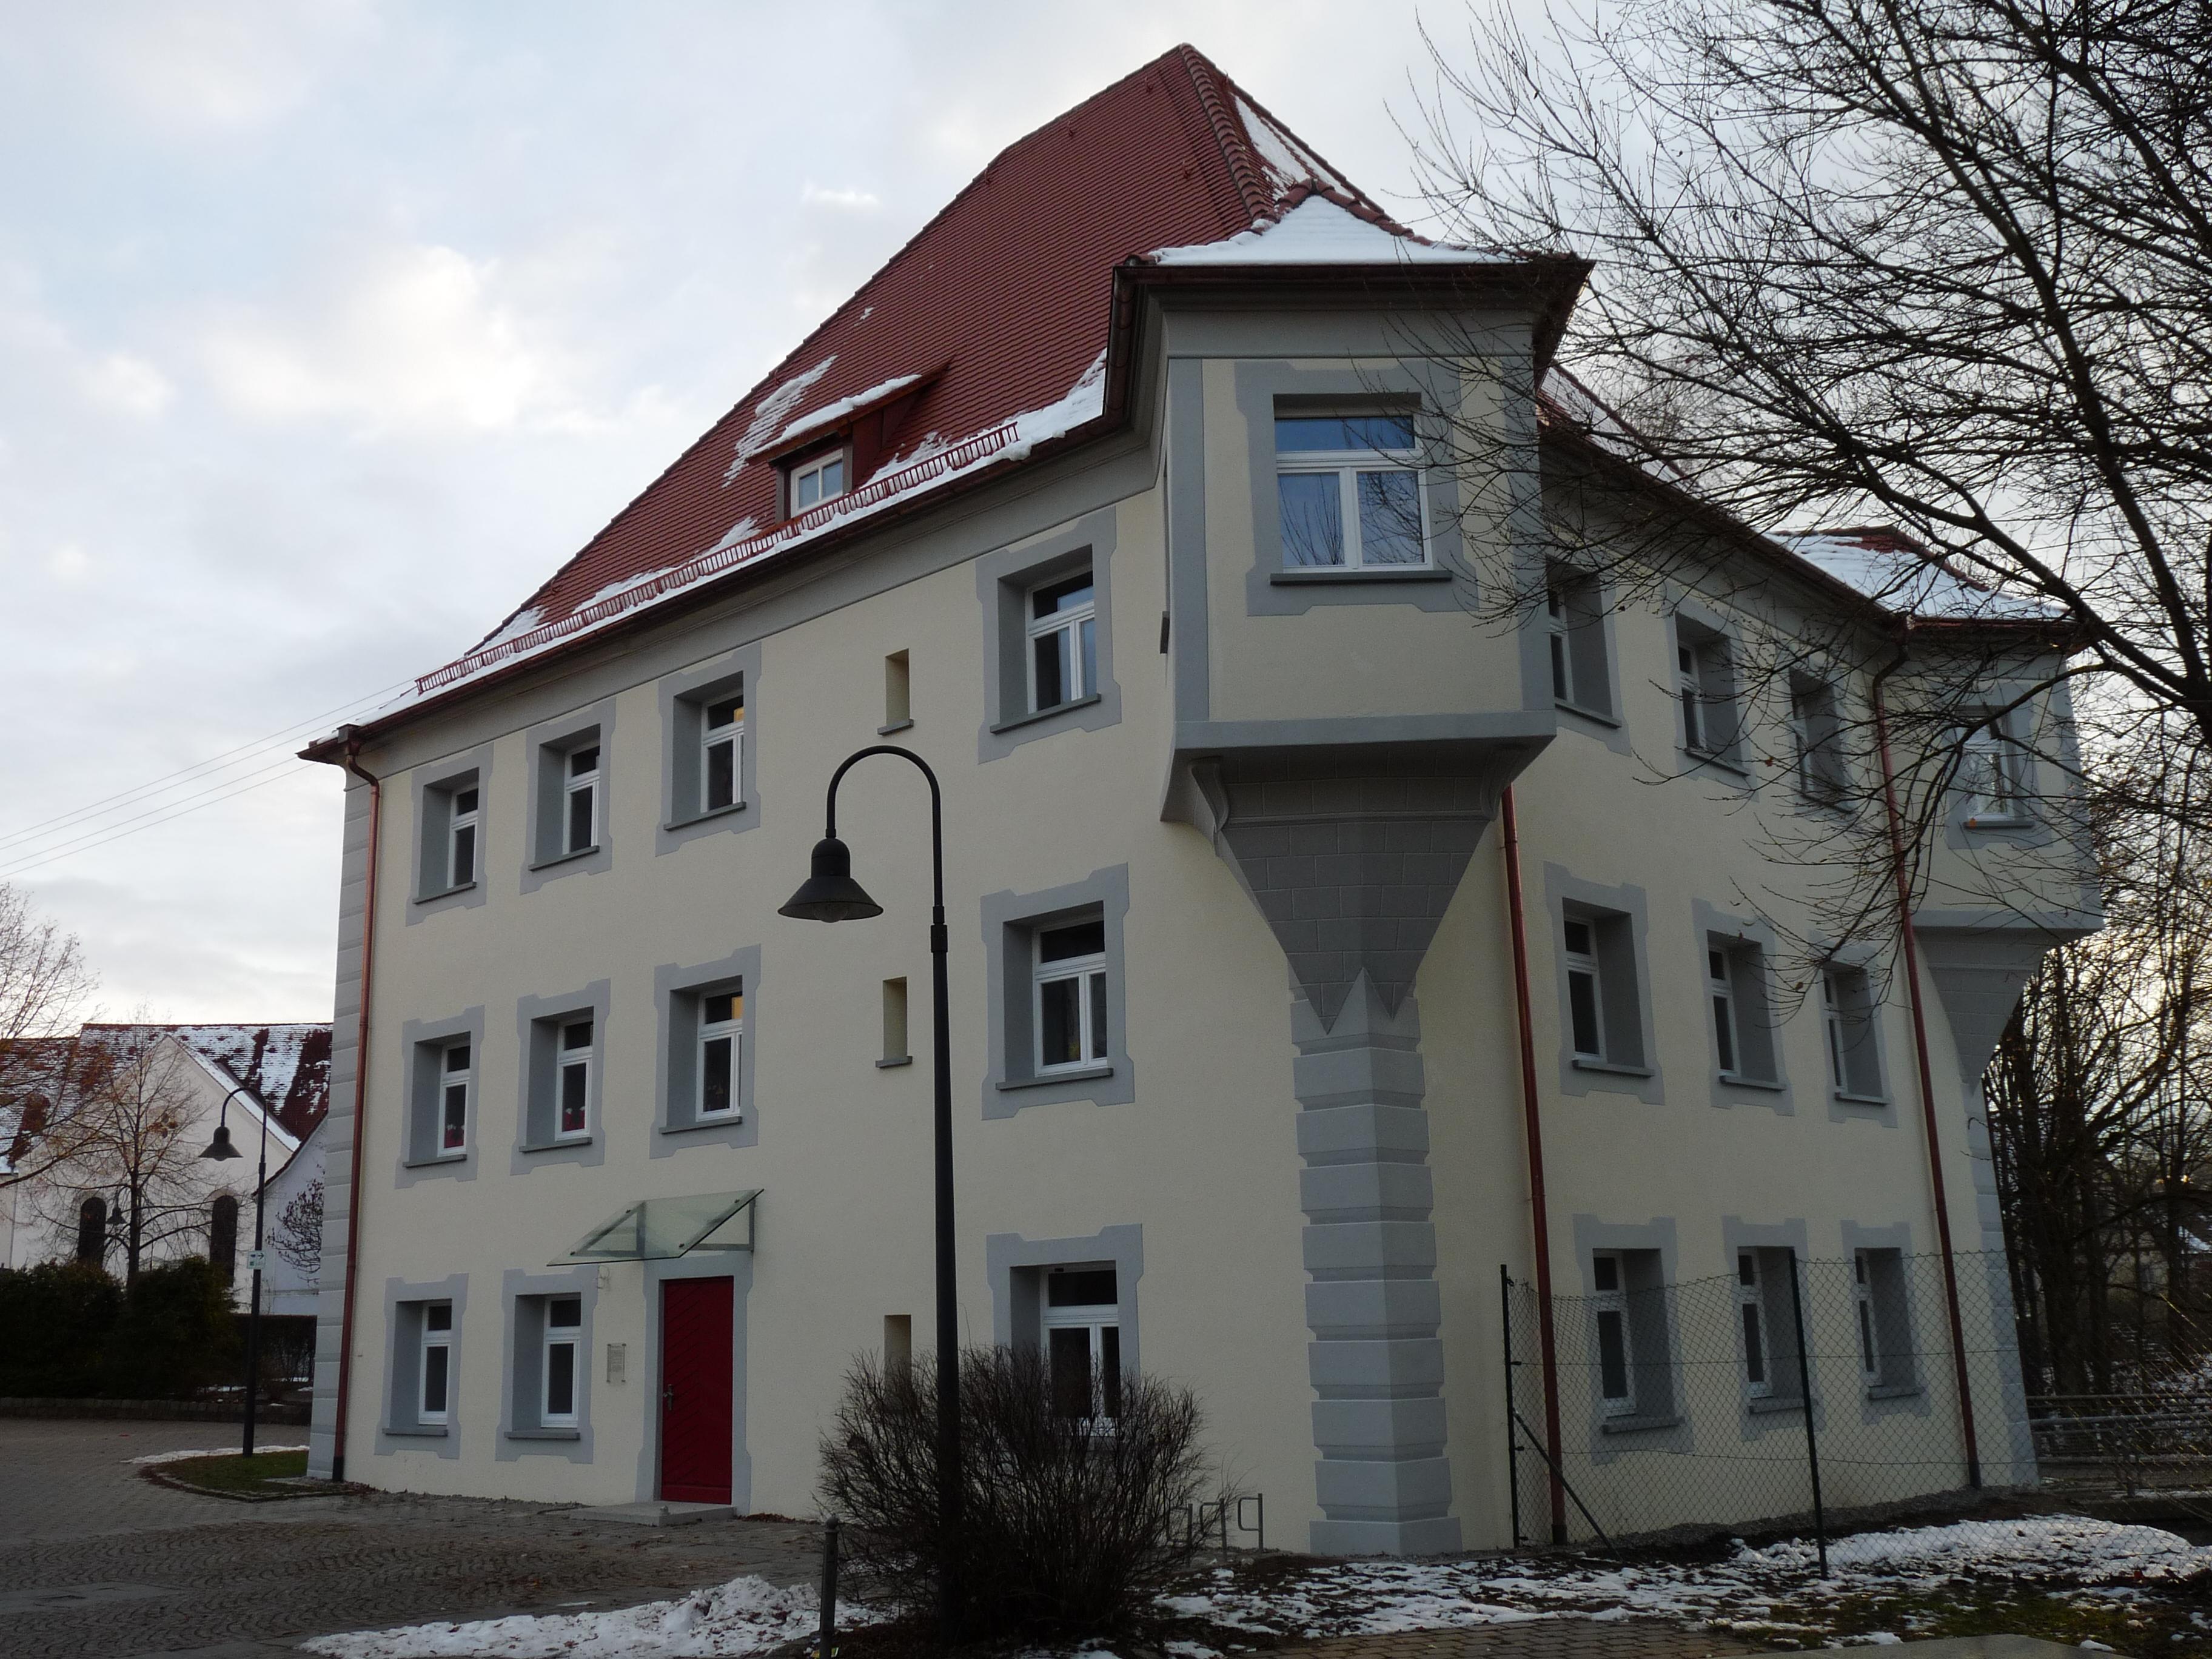 File Schlosschen Ratzenhofen In Sigmaringendorf Jpg Wikimedia Commons